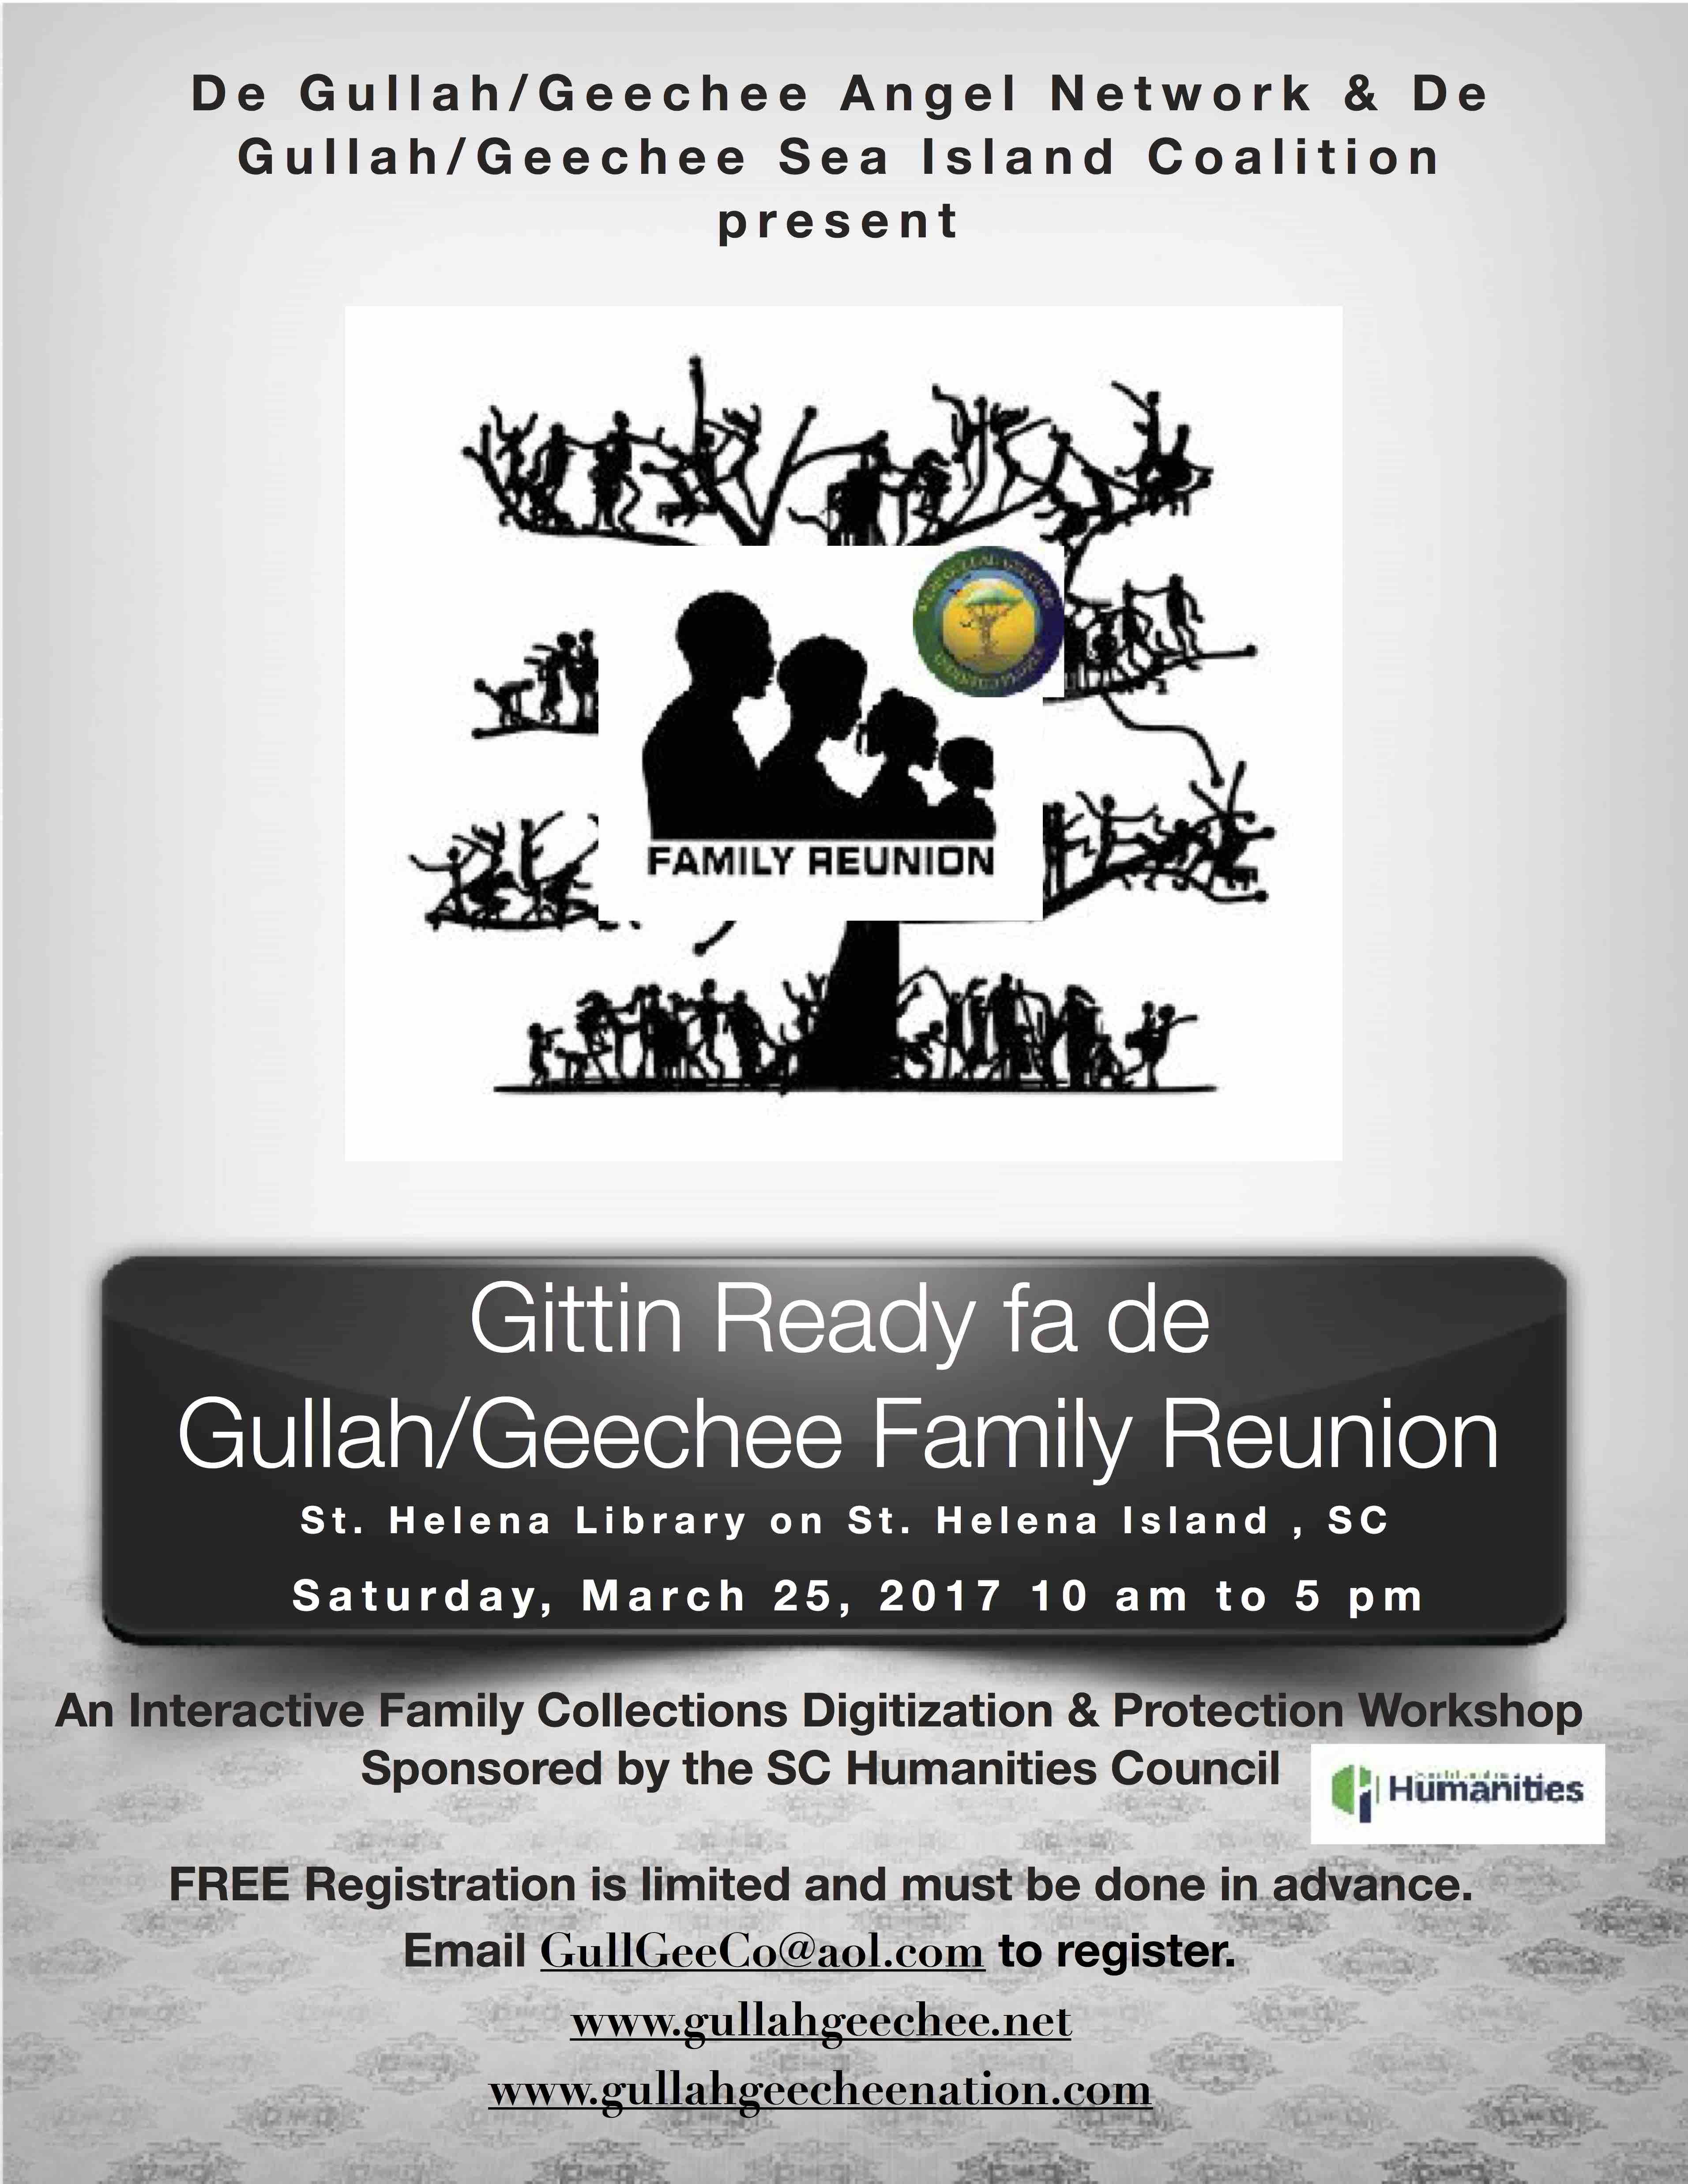 Gittin Ready fa de Gullah/Geechee Family Reunion